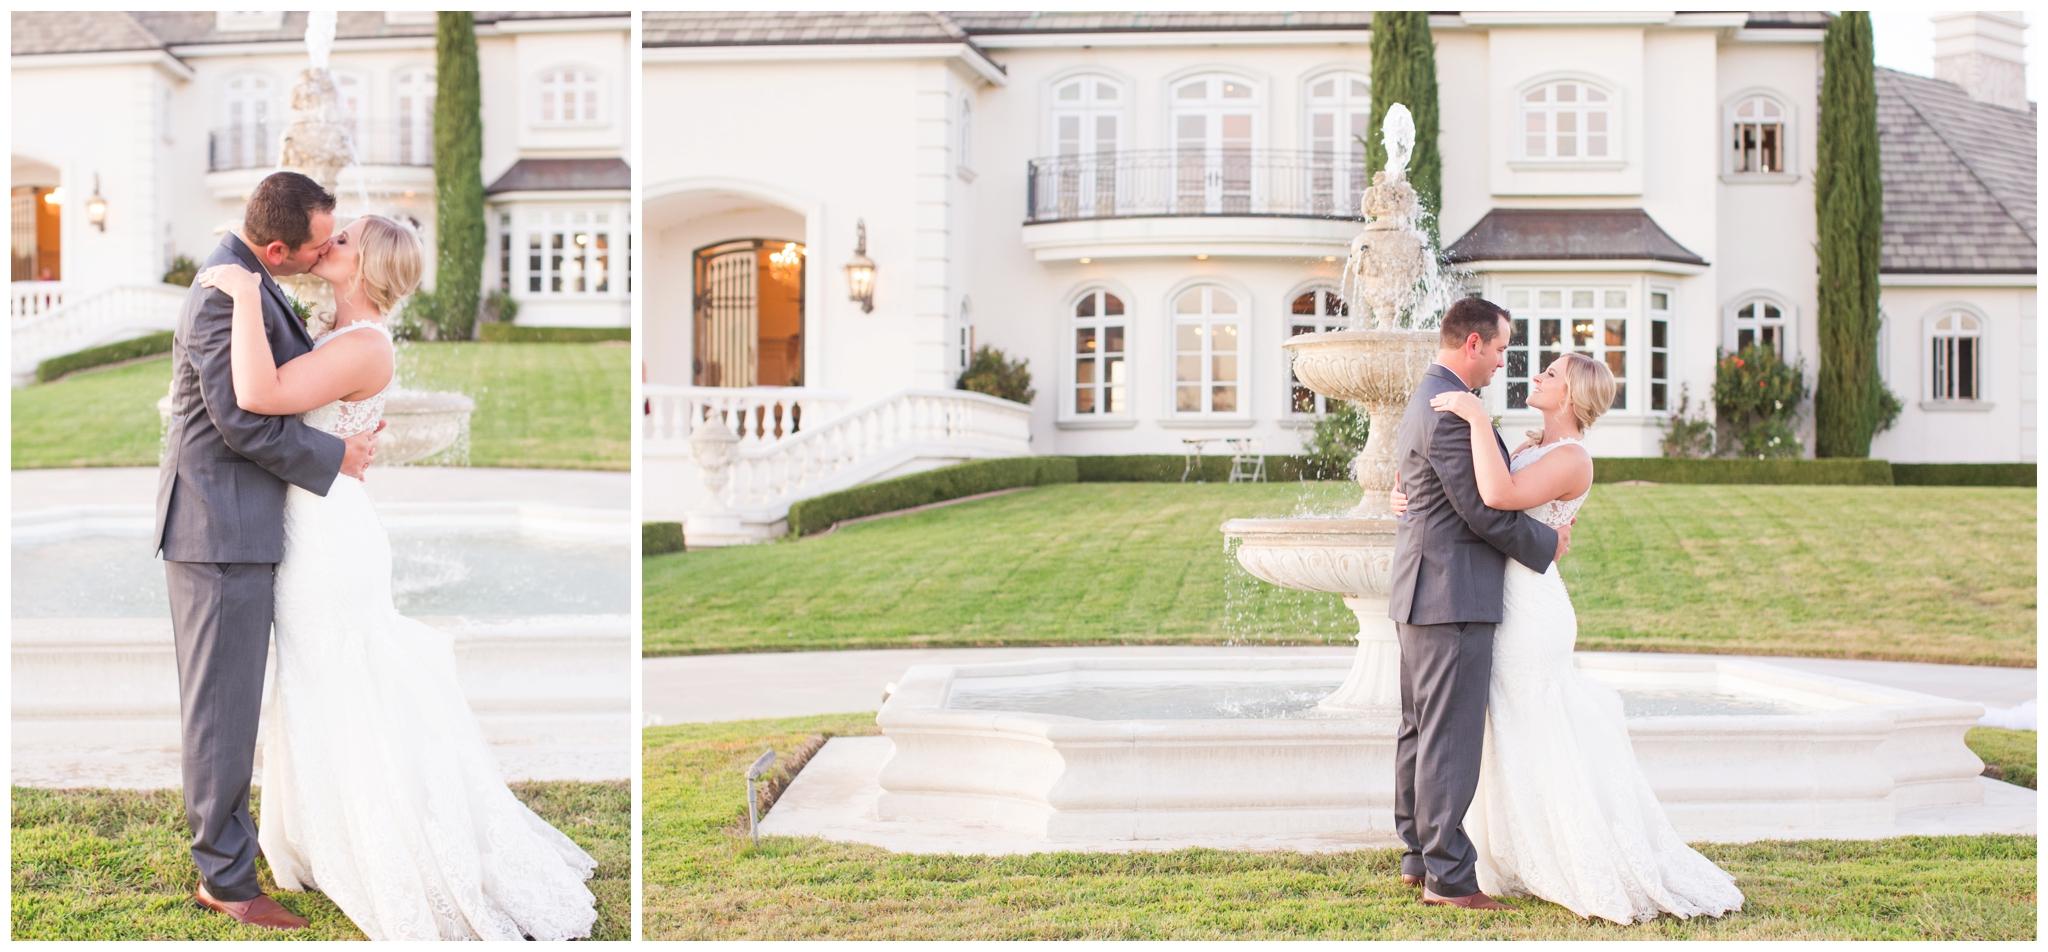 Kassie and Heath at the beautiful Serotonin Manor in Cottonwood, California.